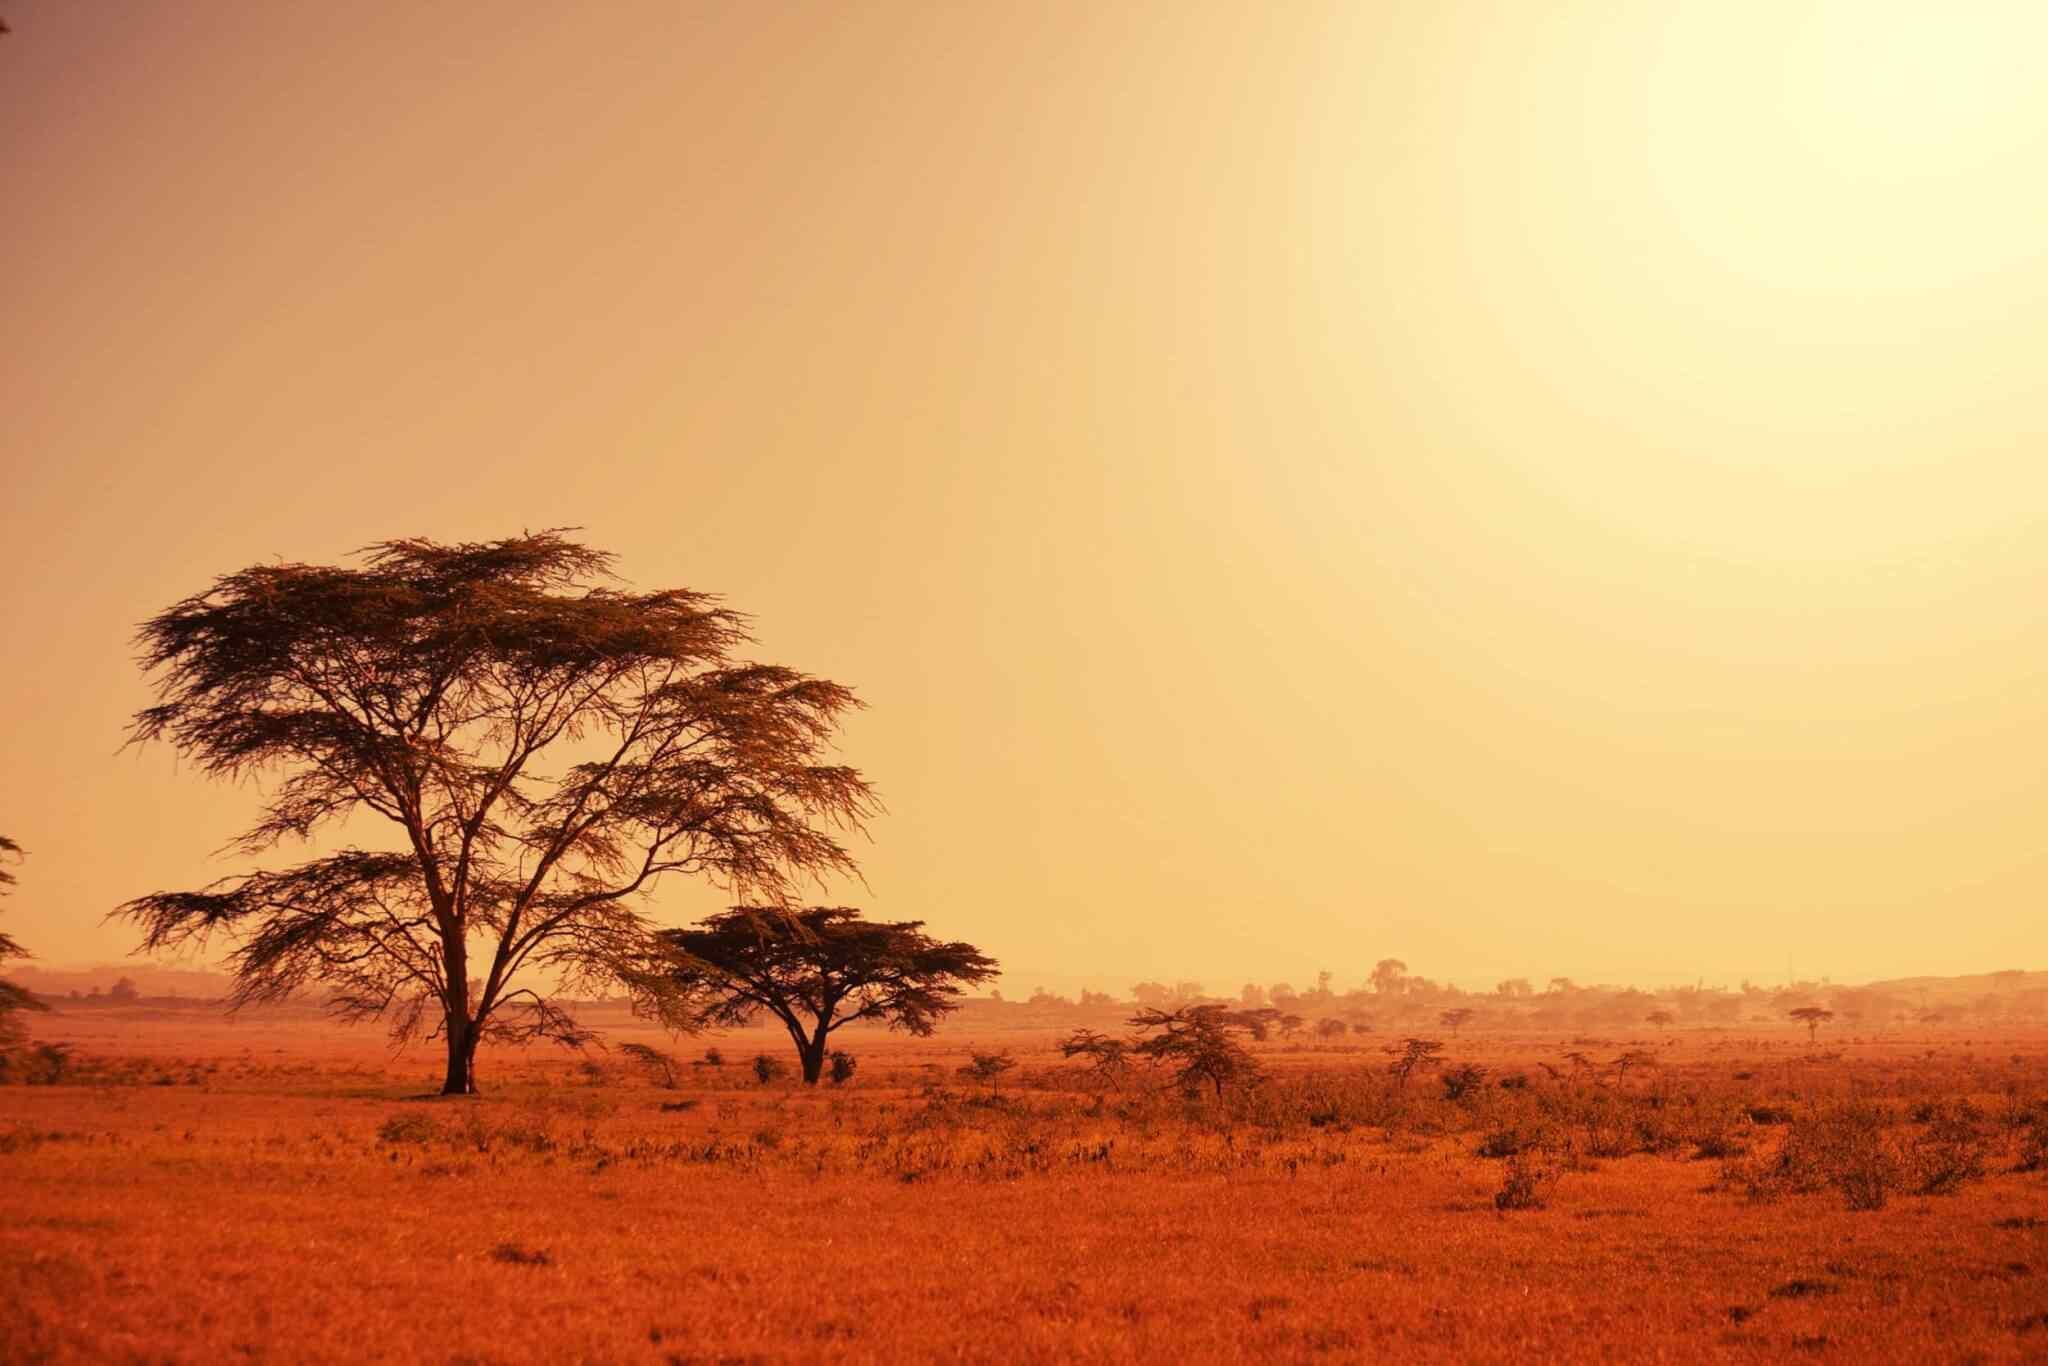 https://ecotours-senegal.com/wp-content/uploads/2018/09/tour-africa-02.jpg